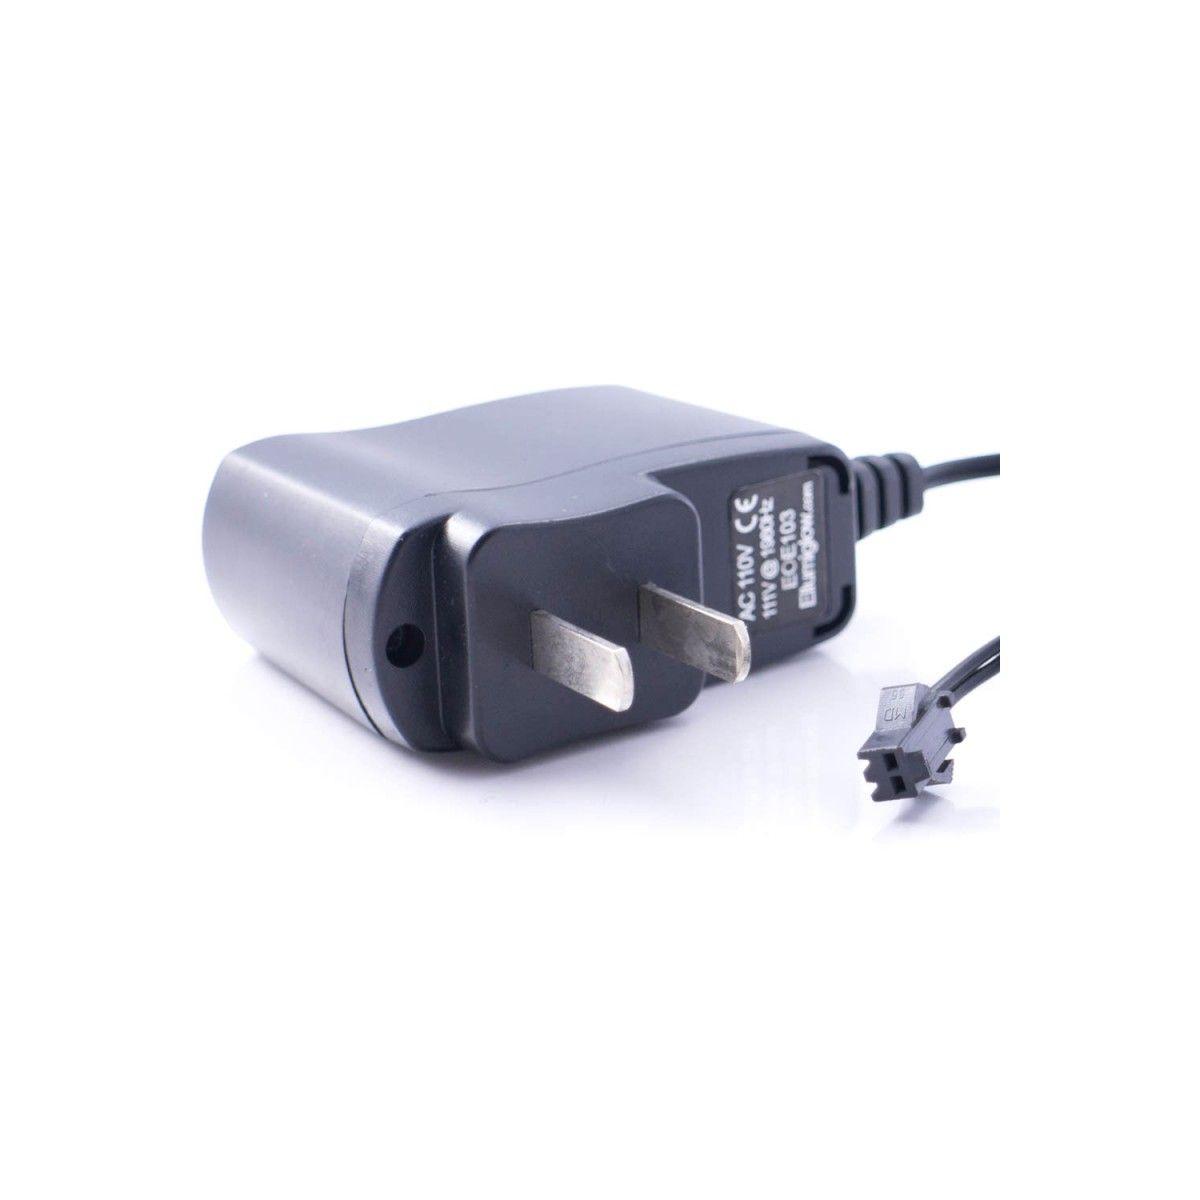 Standard Plug-in EL Wire Inverter | ILLUMINATION | Pinterest